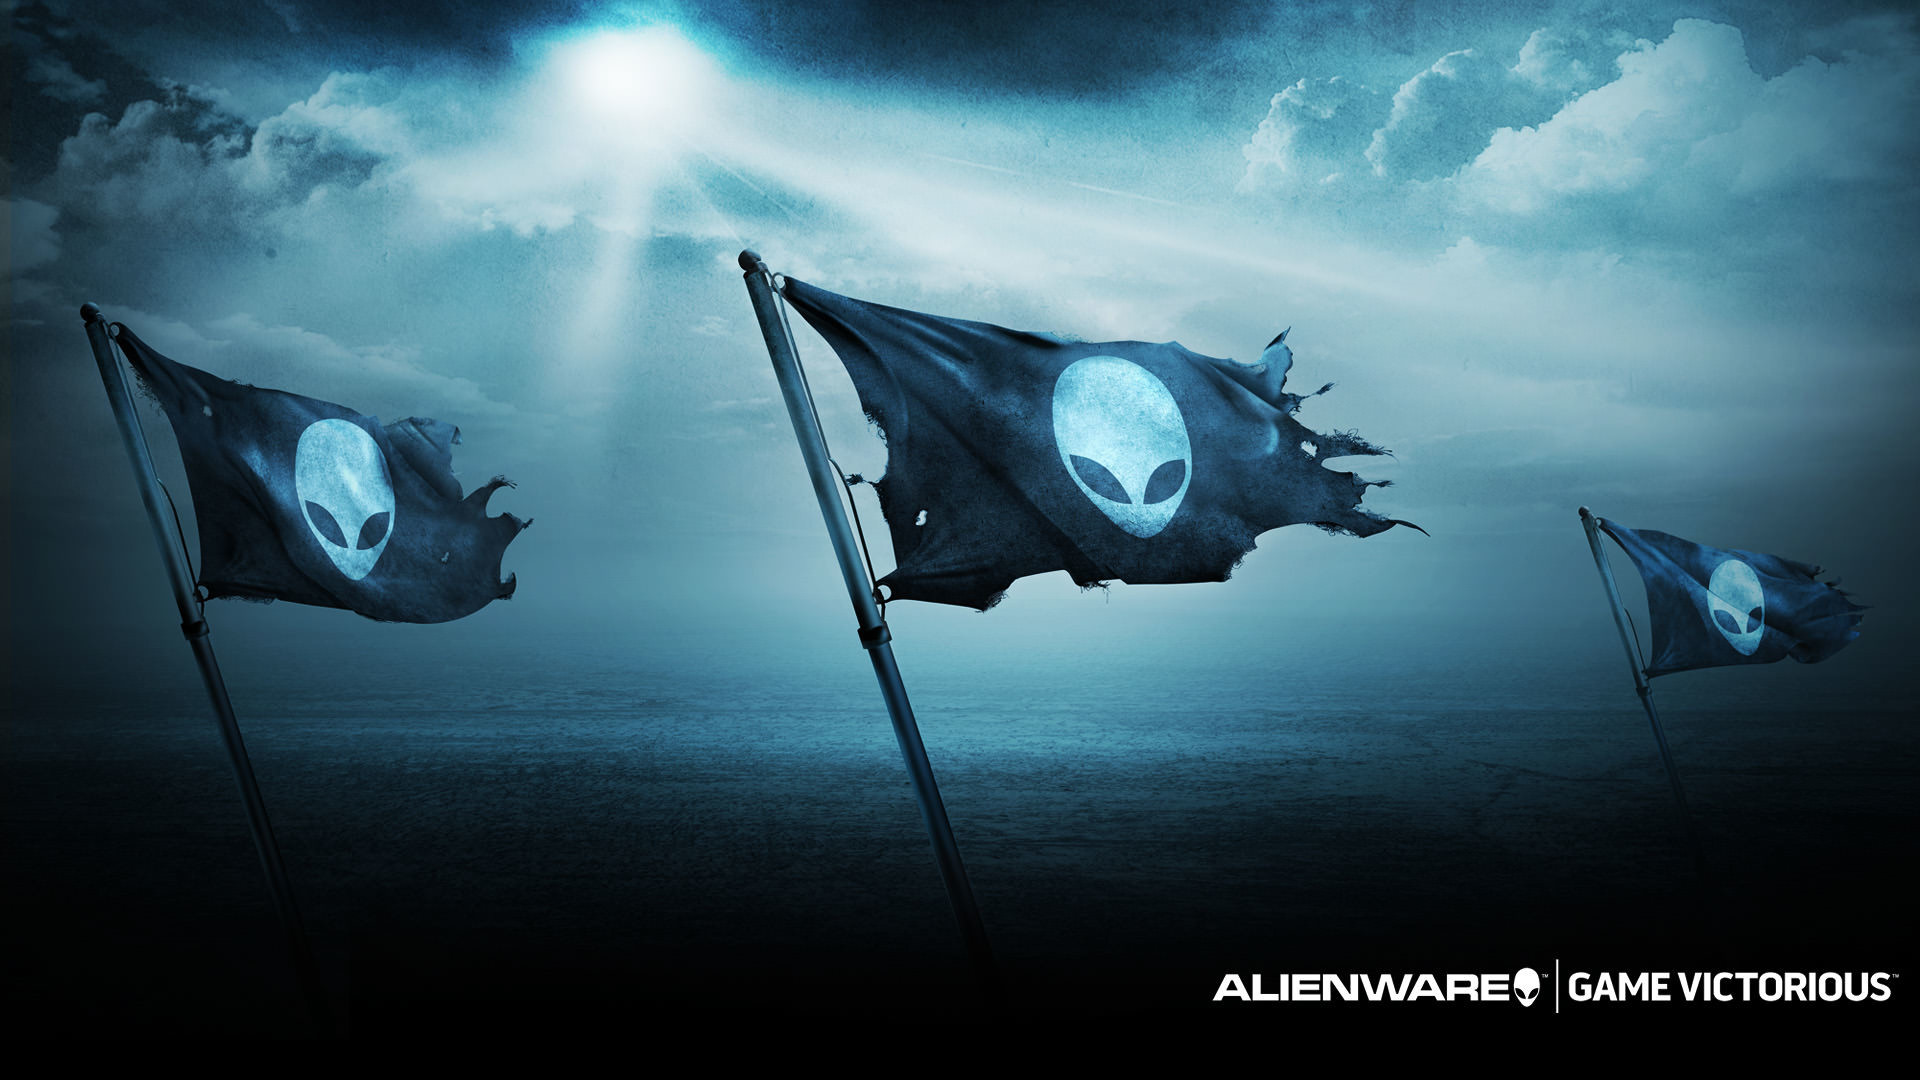 HD Alienware Wallpaper. HD Alienware Wallpaper 1920×1080